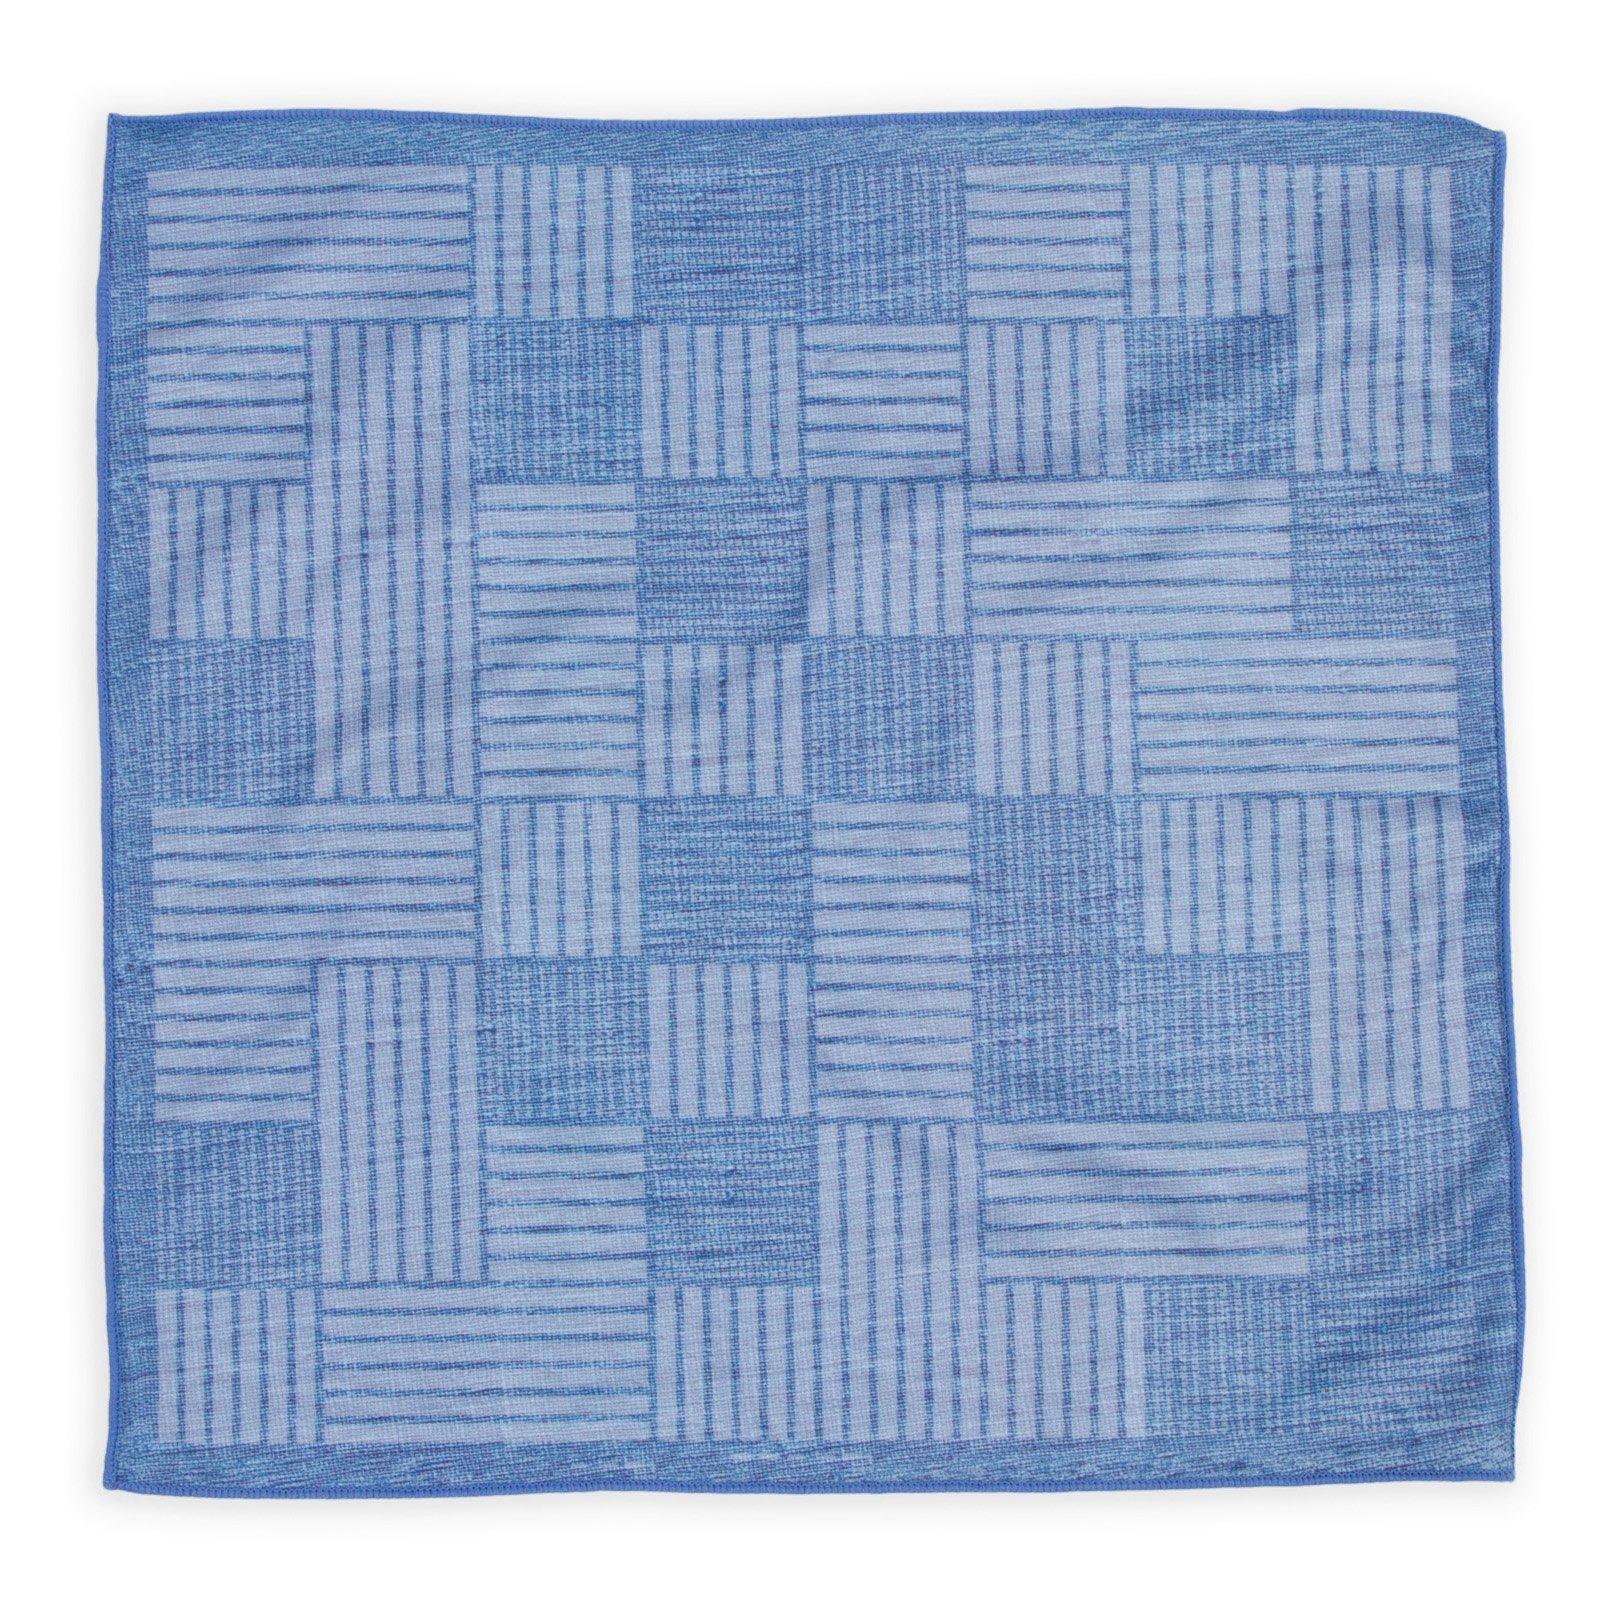 Declan 12.2 Inch Microfiber Pocket Square, Handkerchief, Cleaning Cloth (Calvin) by Declan